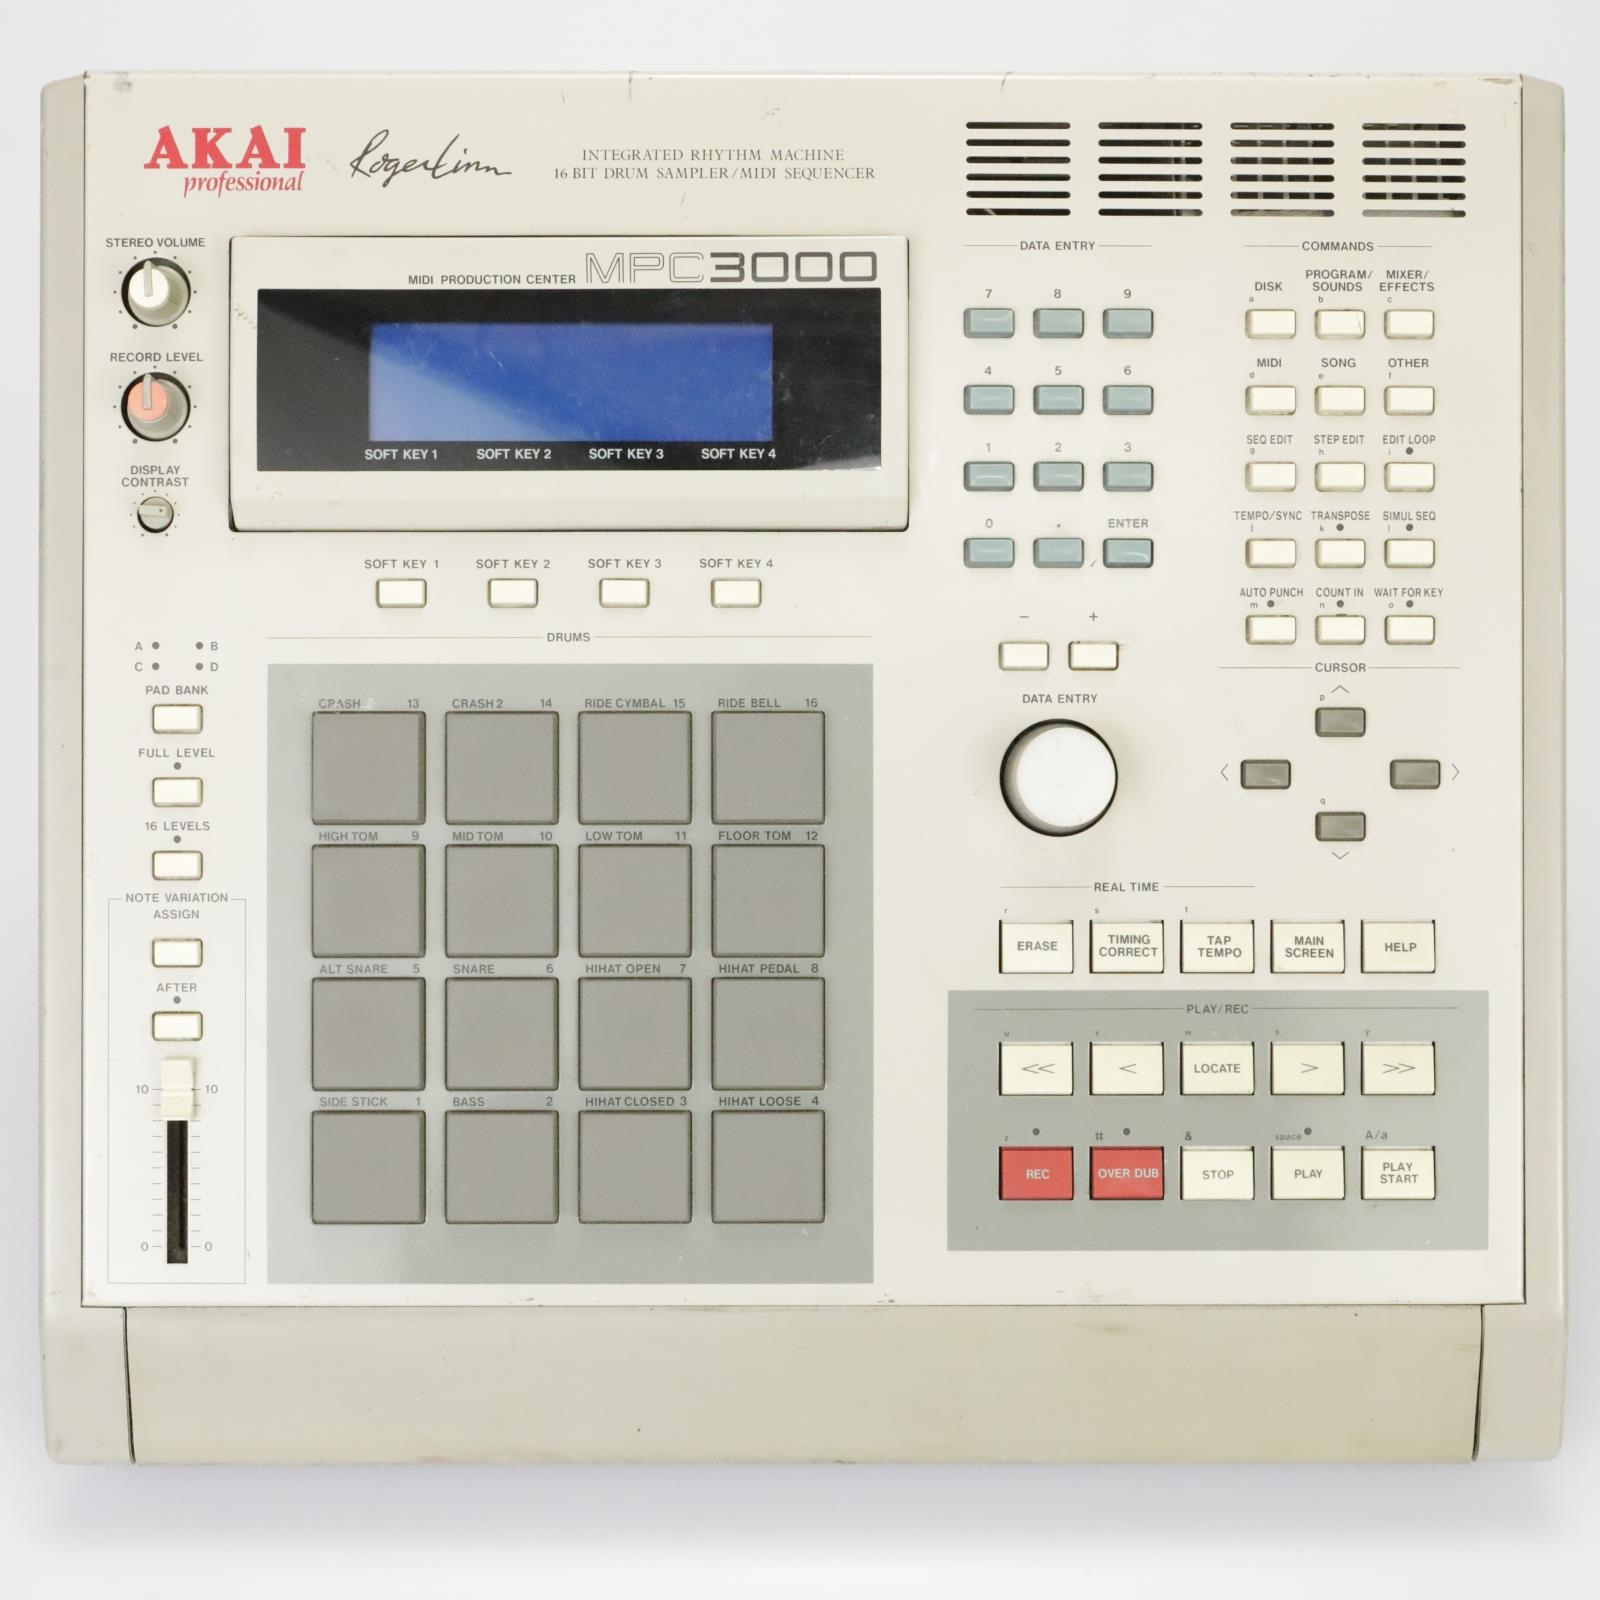 AKAI MPC3000 Roger Linn Drum Sampler Machine w/ Zip Drive, Disks & Case #39145